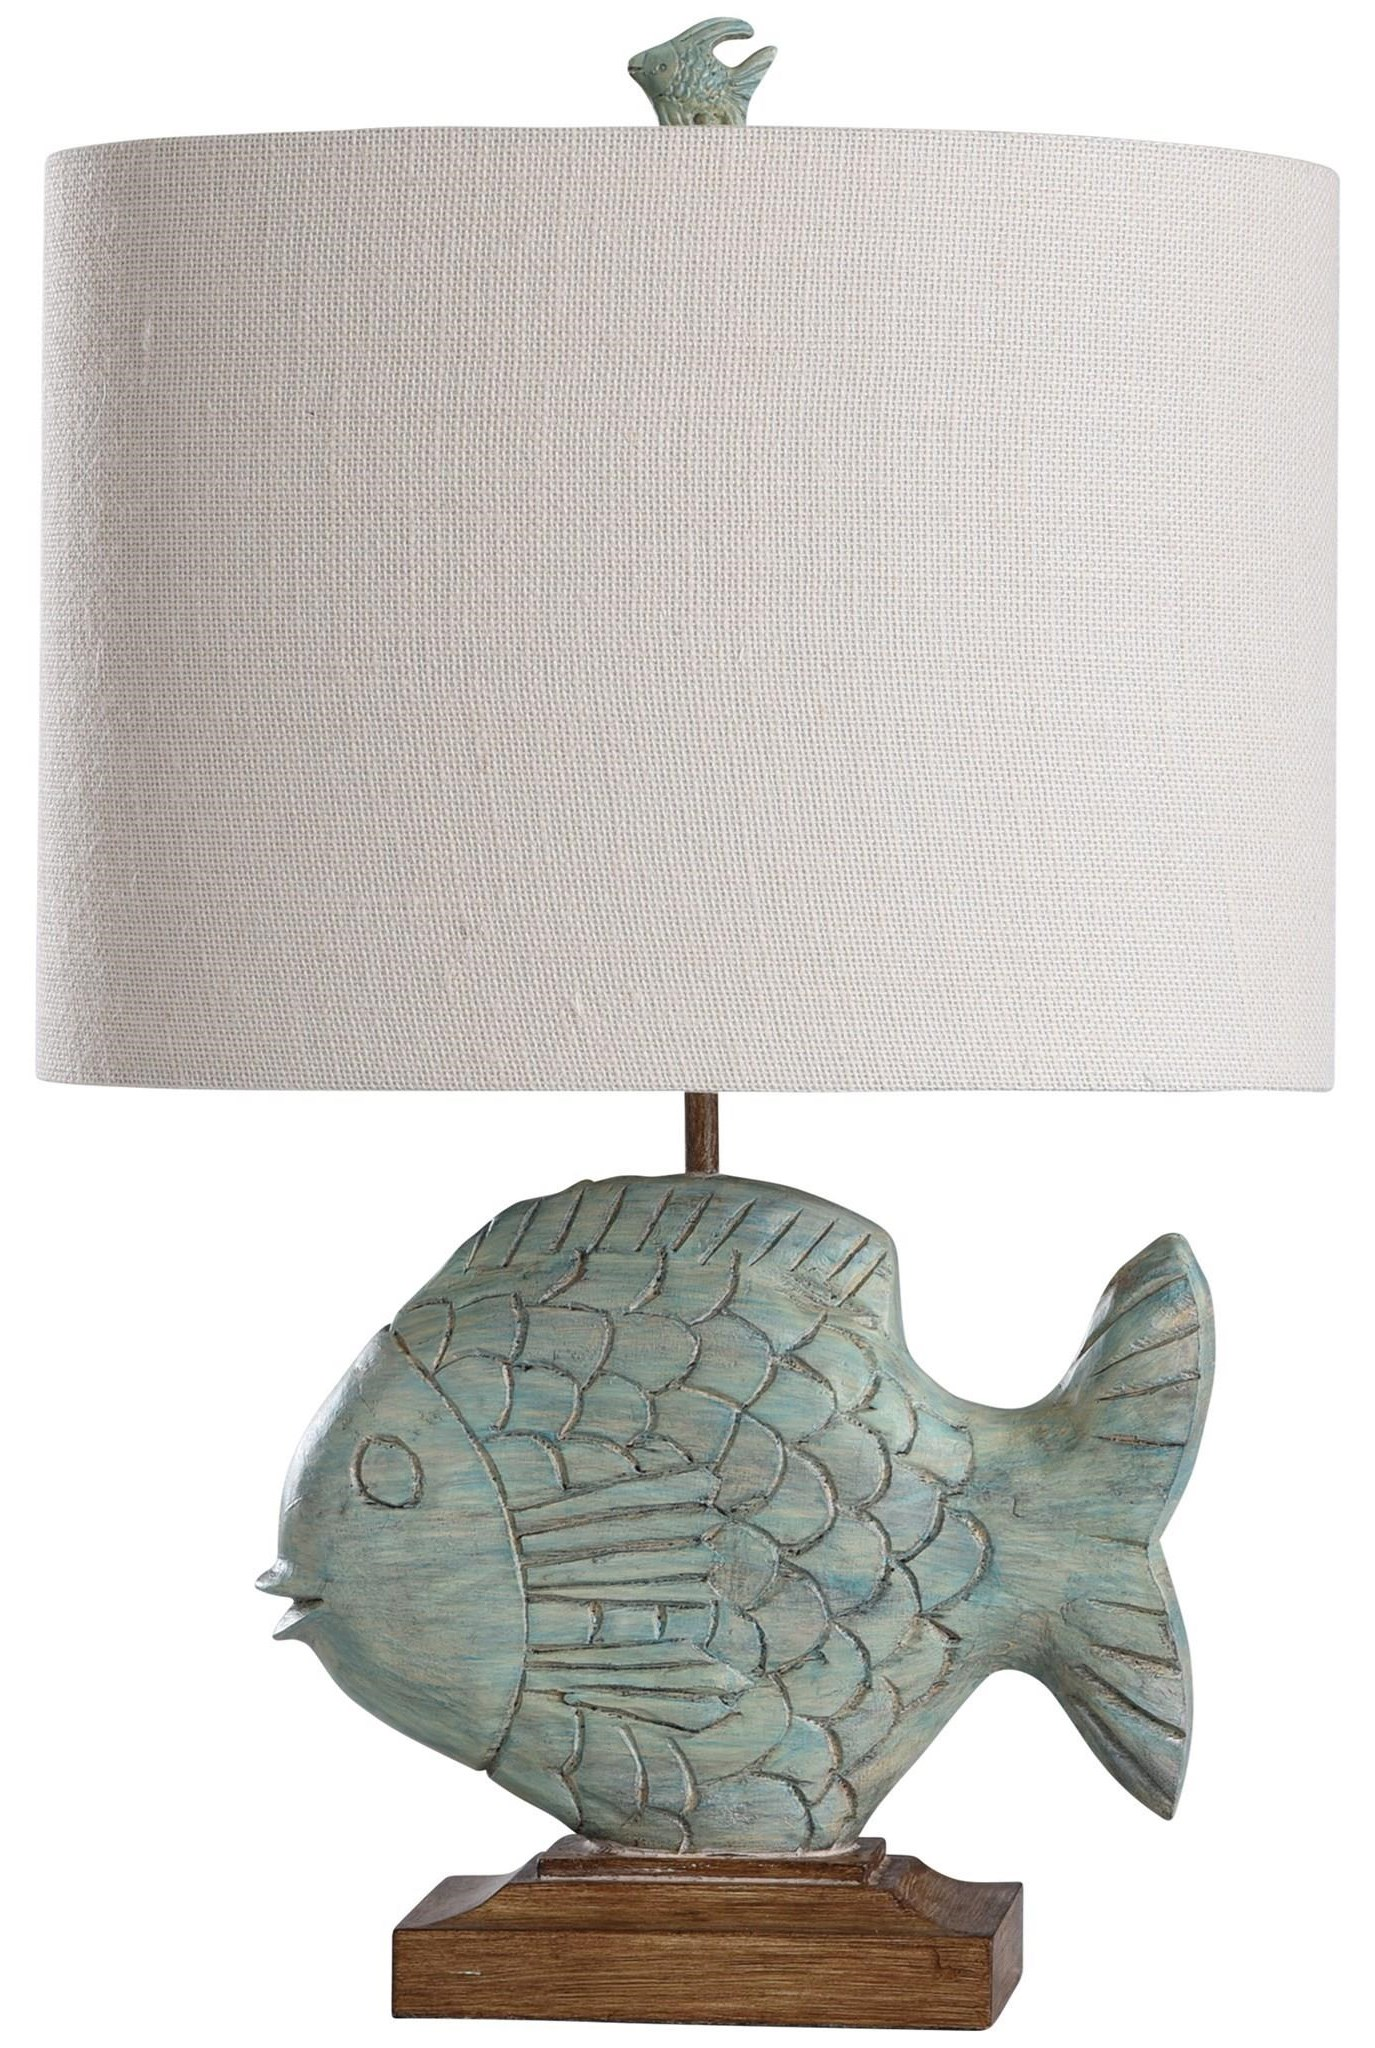 2020 LAMPS Nemo Blue Lamp by StyleCraft at Furniture Fair - North Carolina